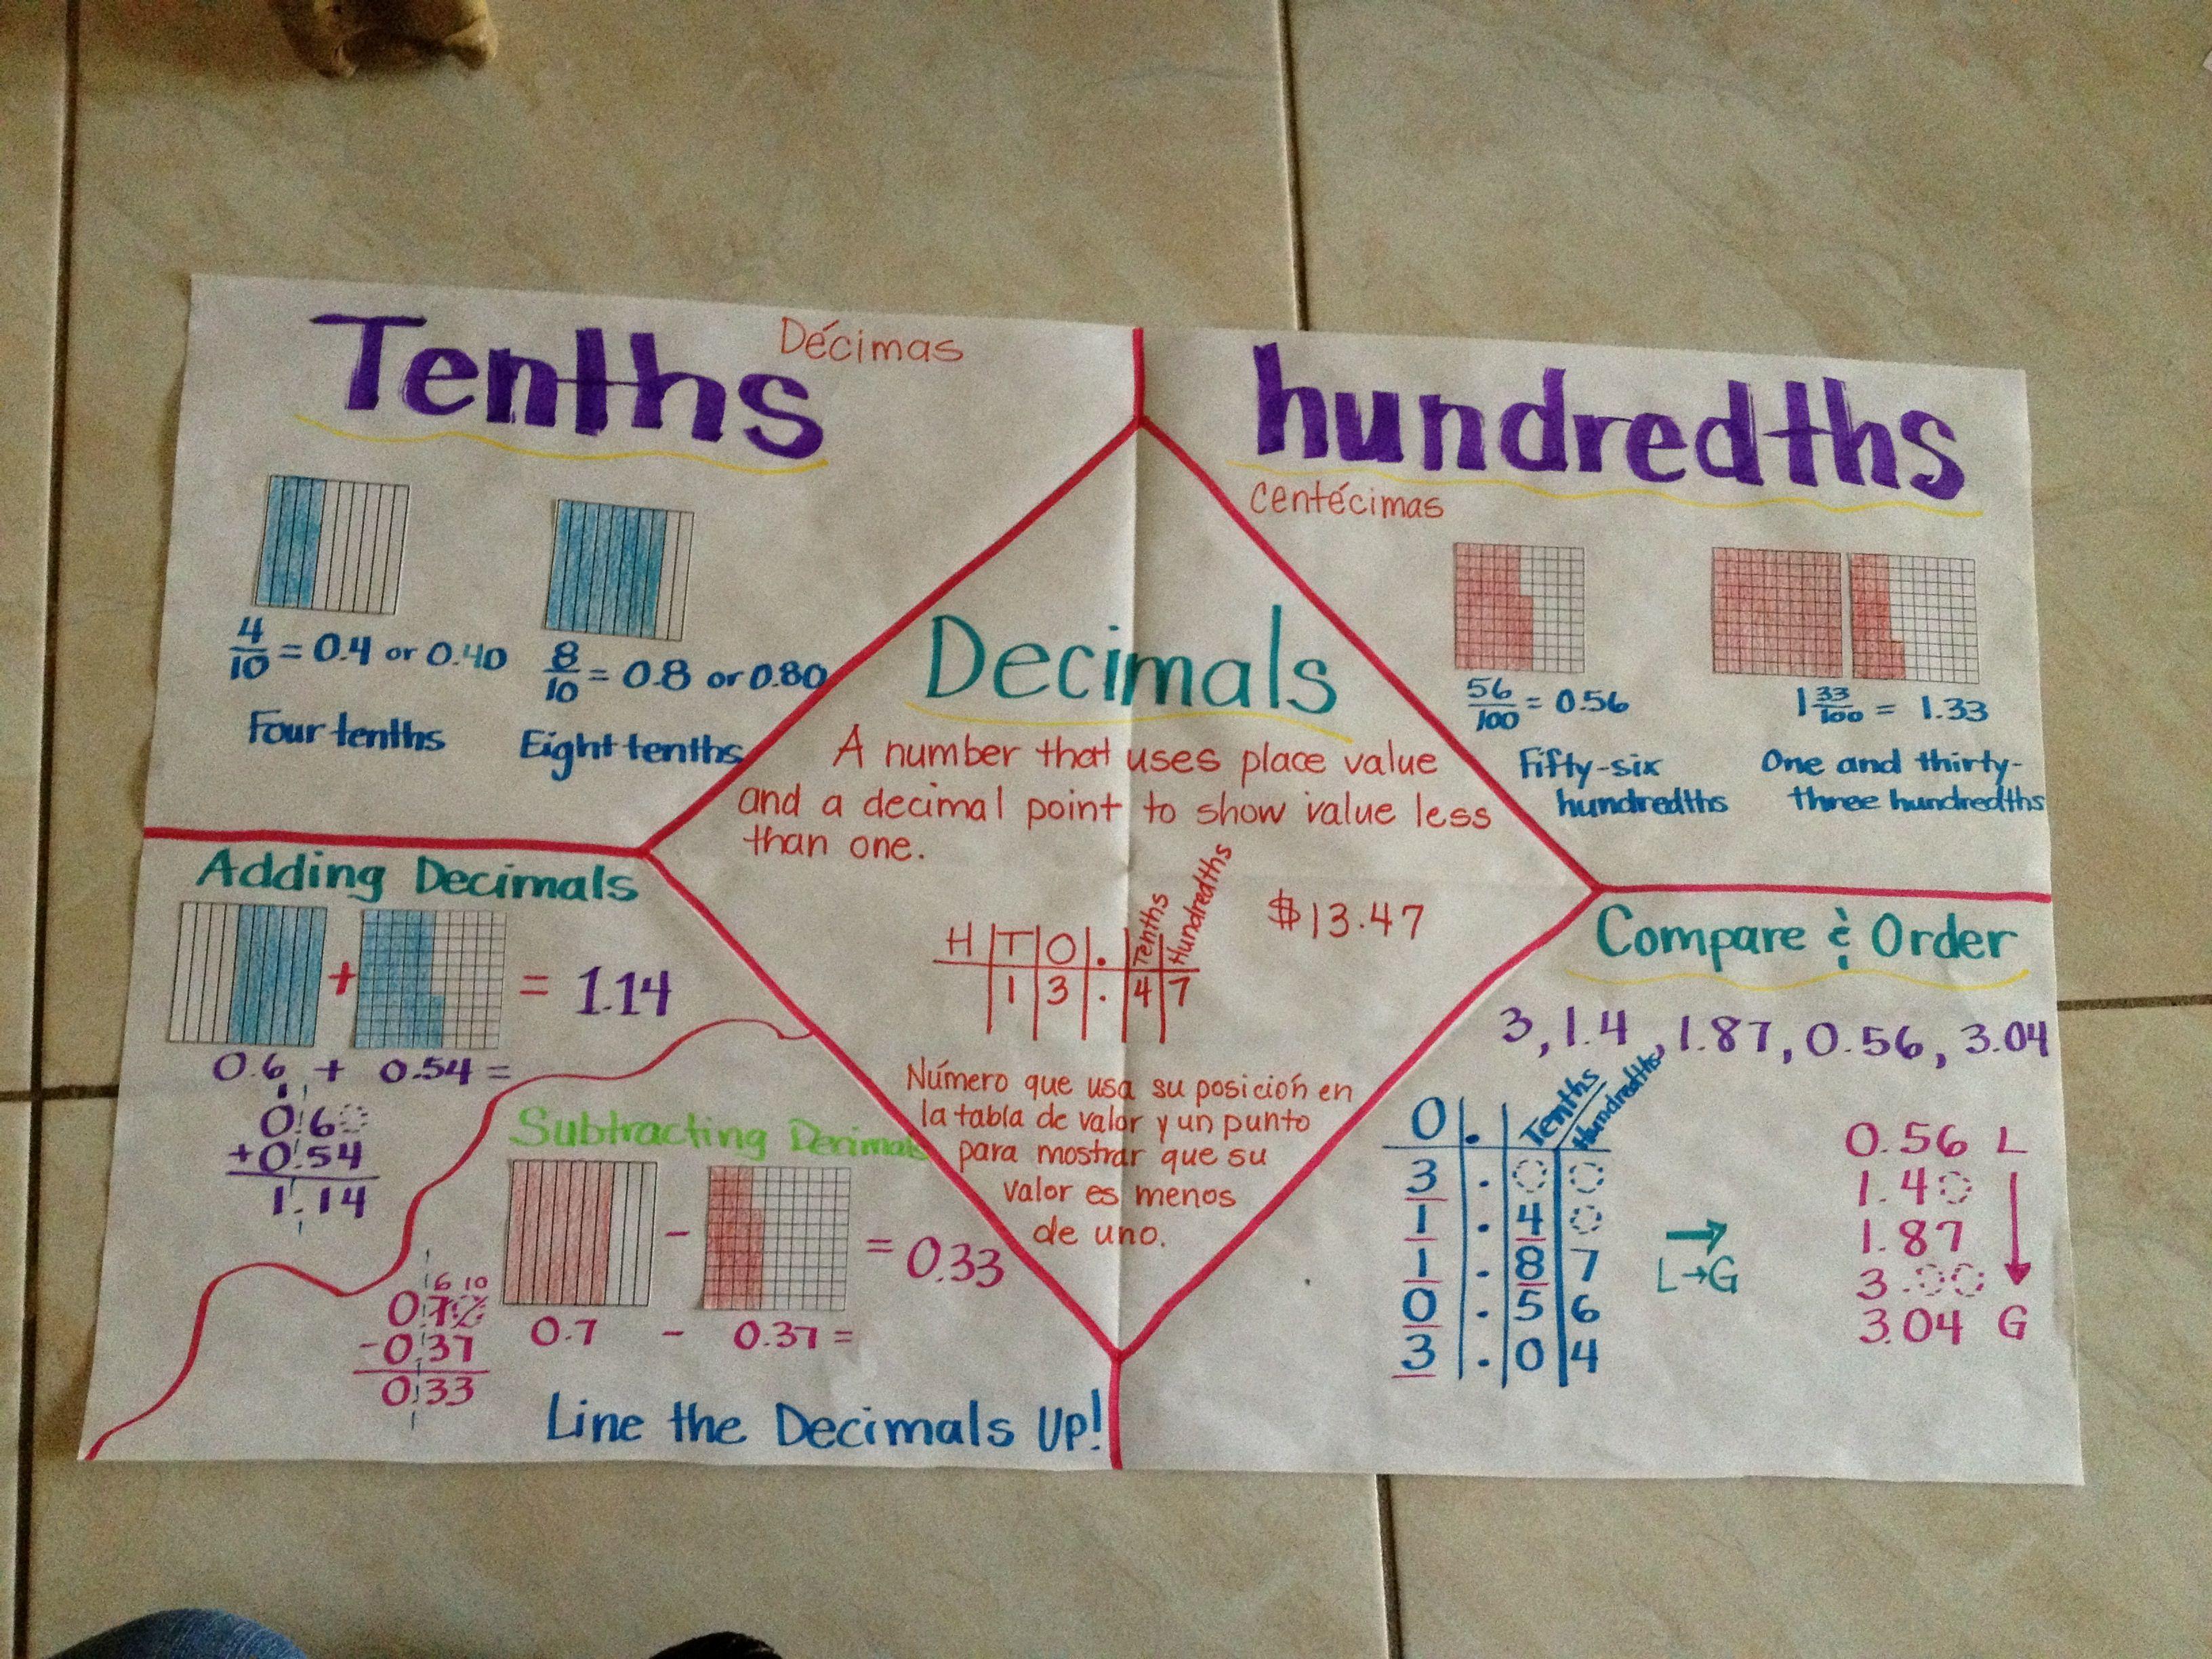 worksheet Hundredth Decimal Place tenthshundredths mathematics pinterest decimal places tenthshundredths